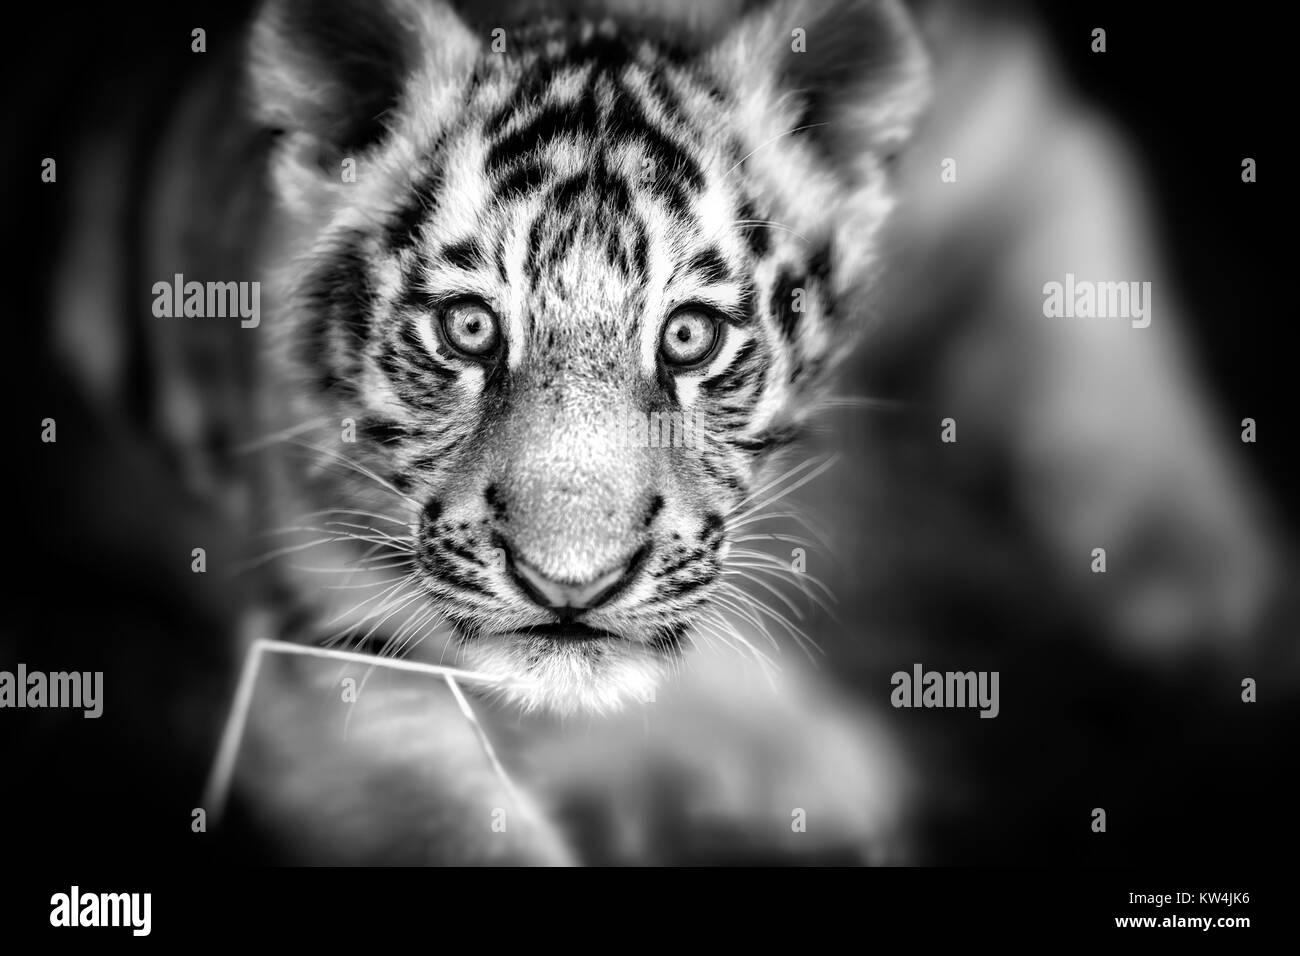 Portrait of a Beautiful Tiger cub. Tiger playing around (Panthera tigris) - Stock Image